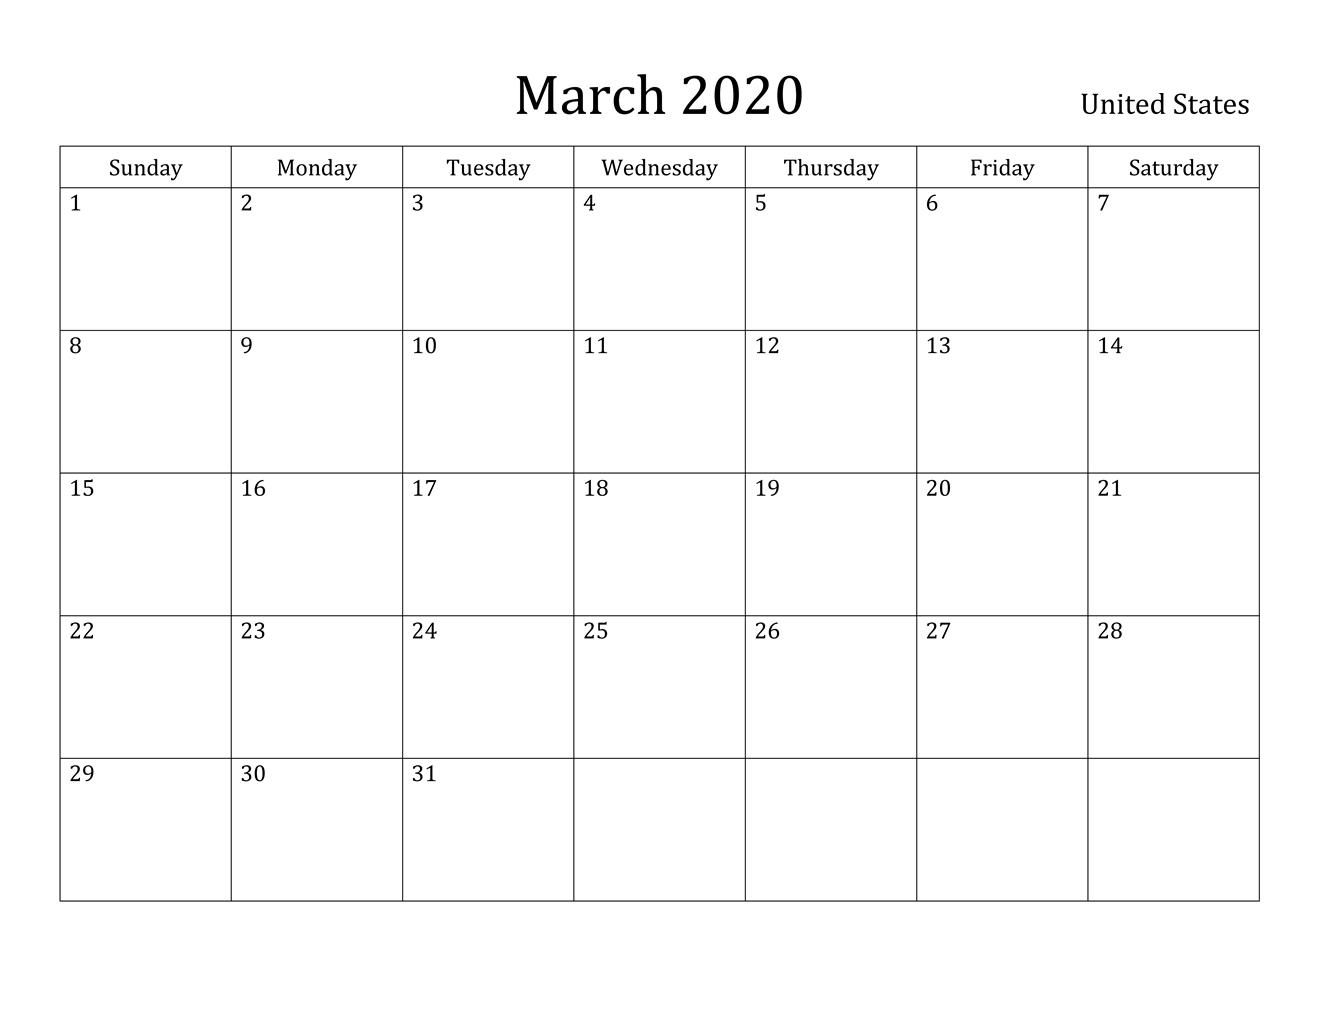 Free March 2020 Printable Calendar - Blank Templates --Print Blank Attendance Calendar 2020